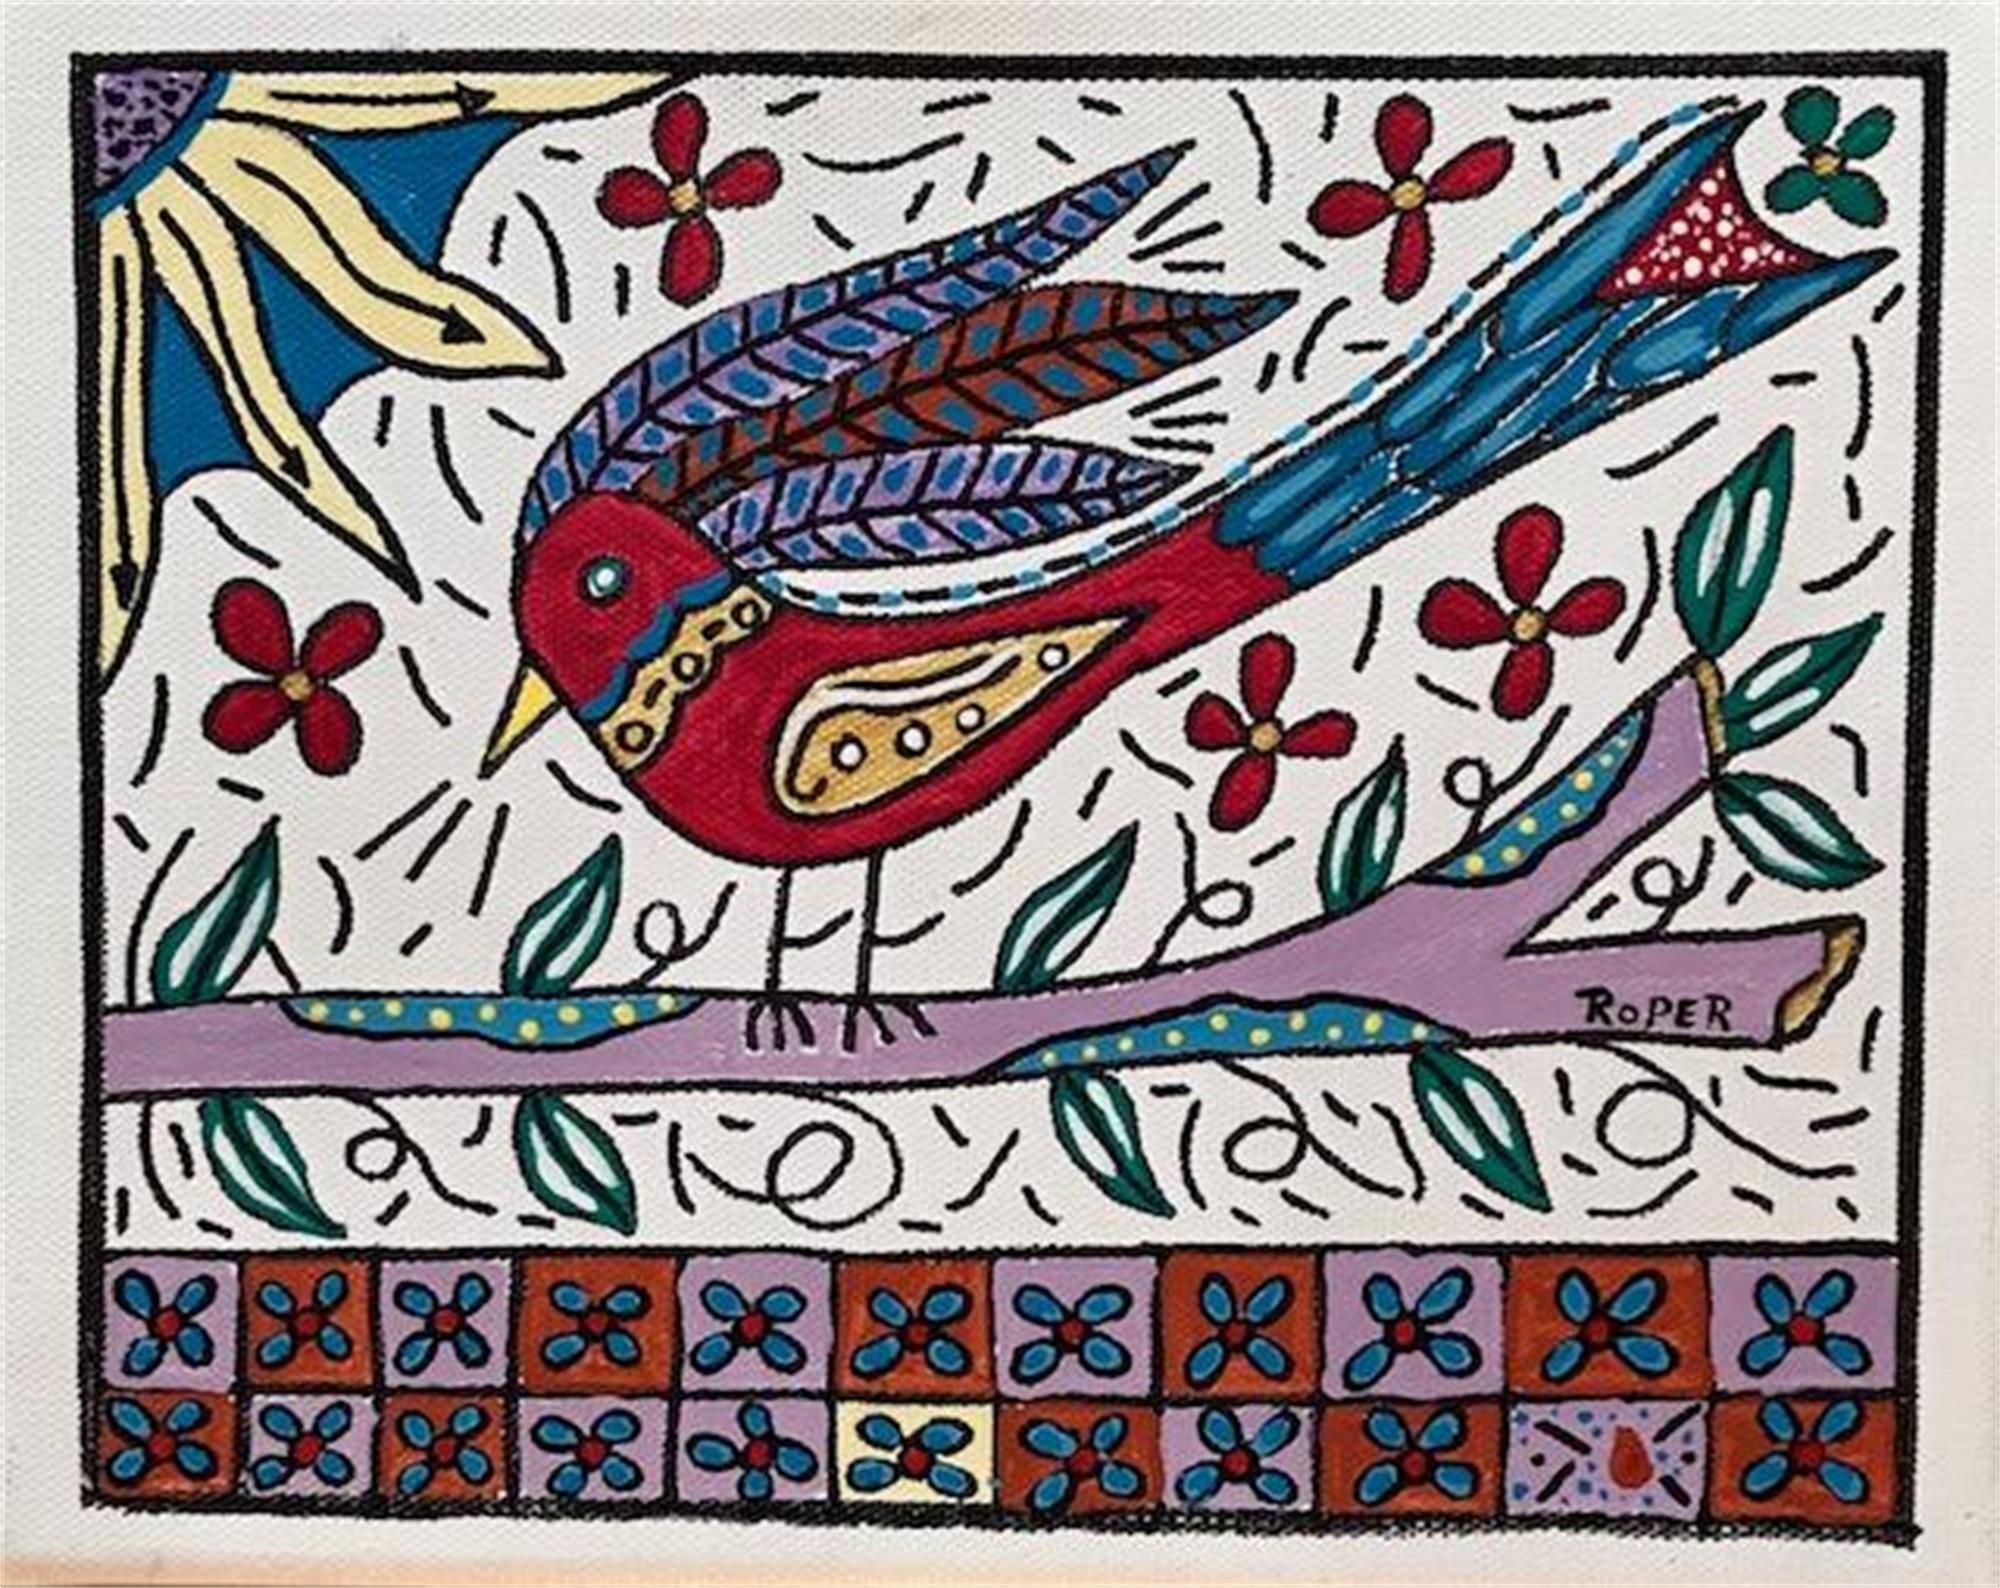 Red Bird on a Limb by Billy Roper